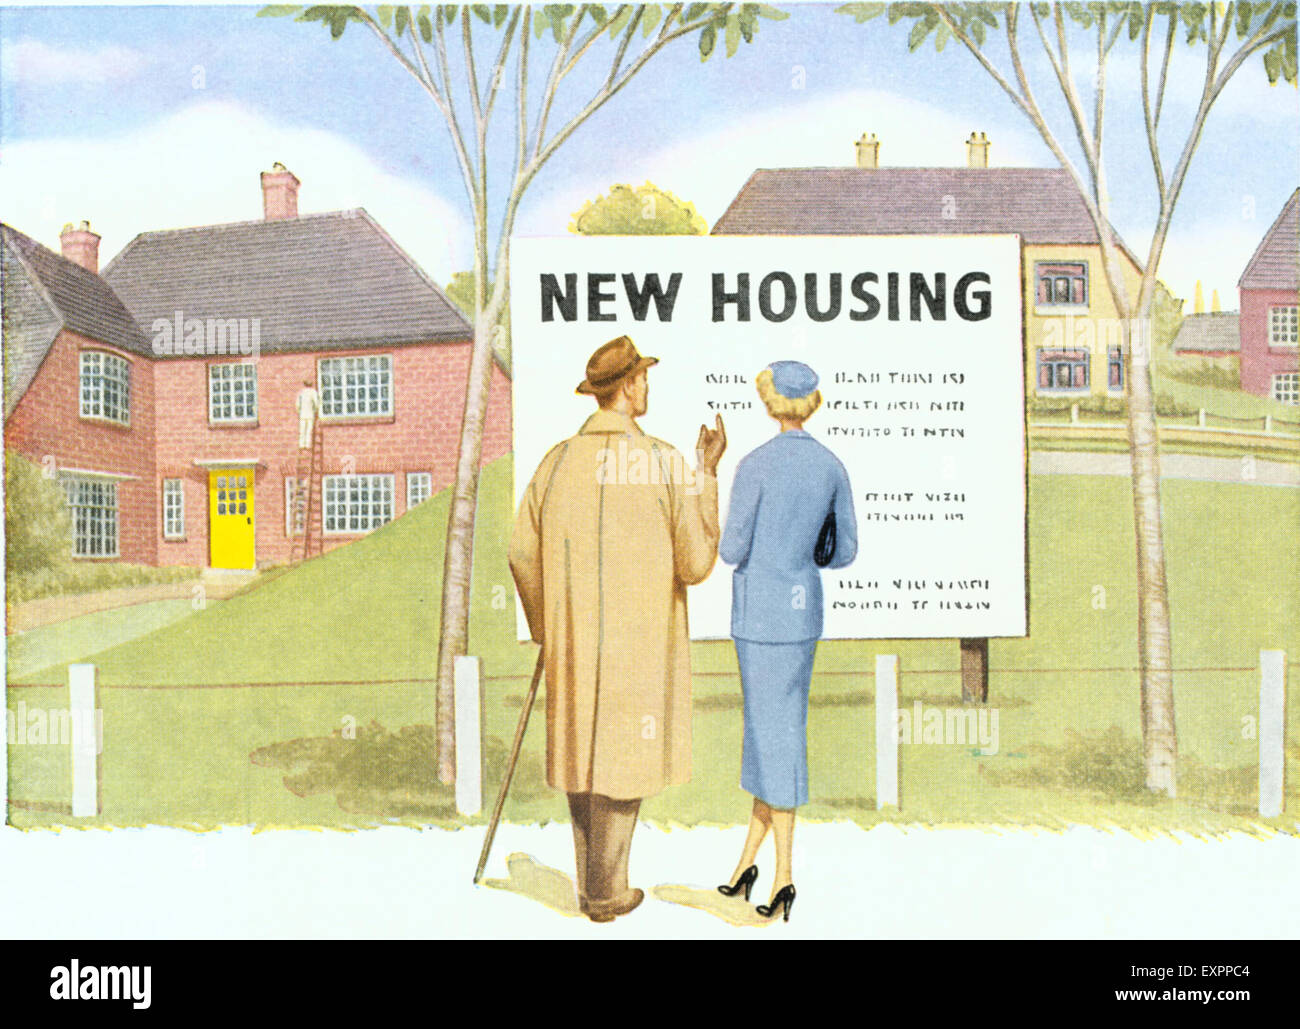 Http Www Alamy Com Stock Photo 1950s Uk New Homes Magazine Advert Detail 85323060 Html